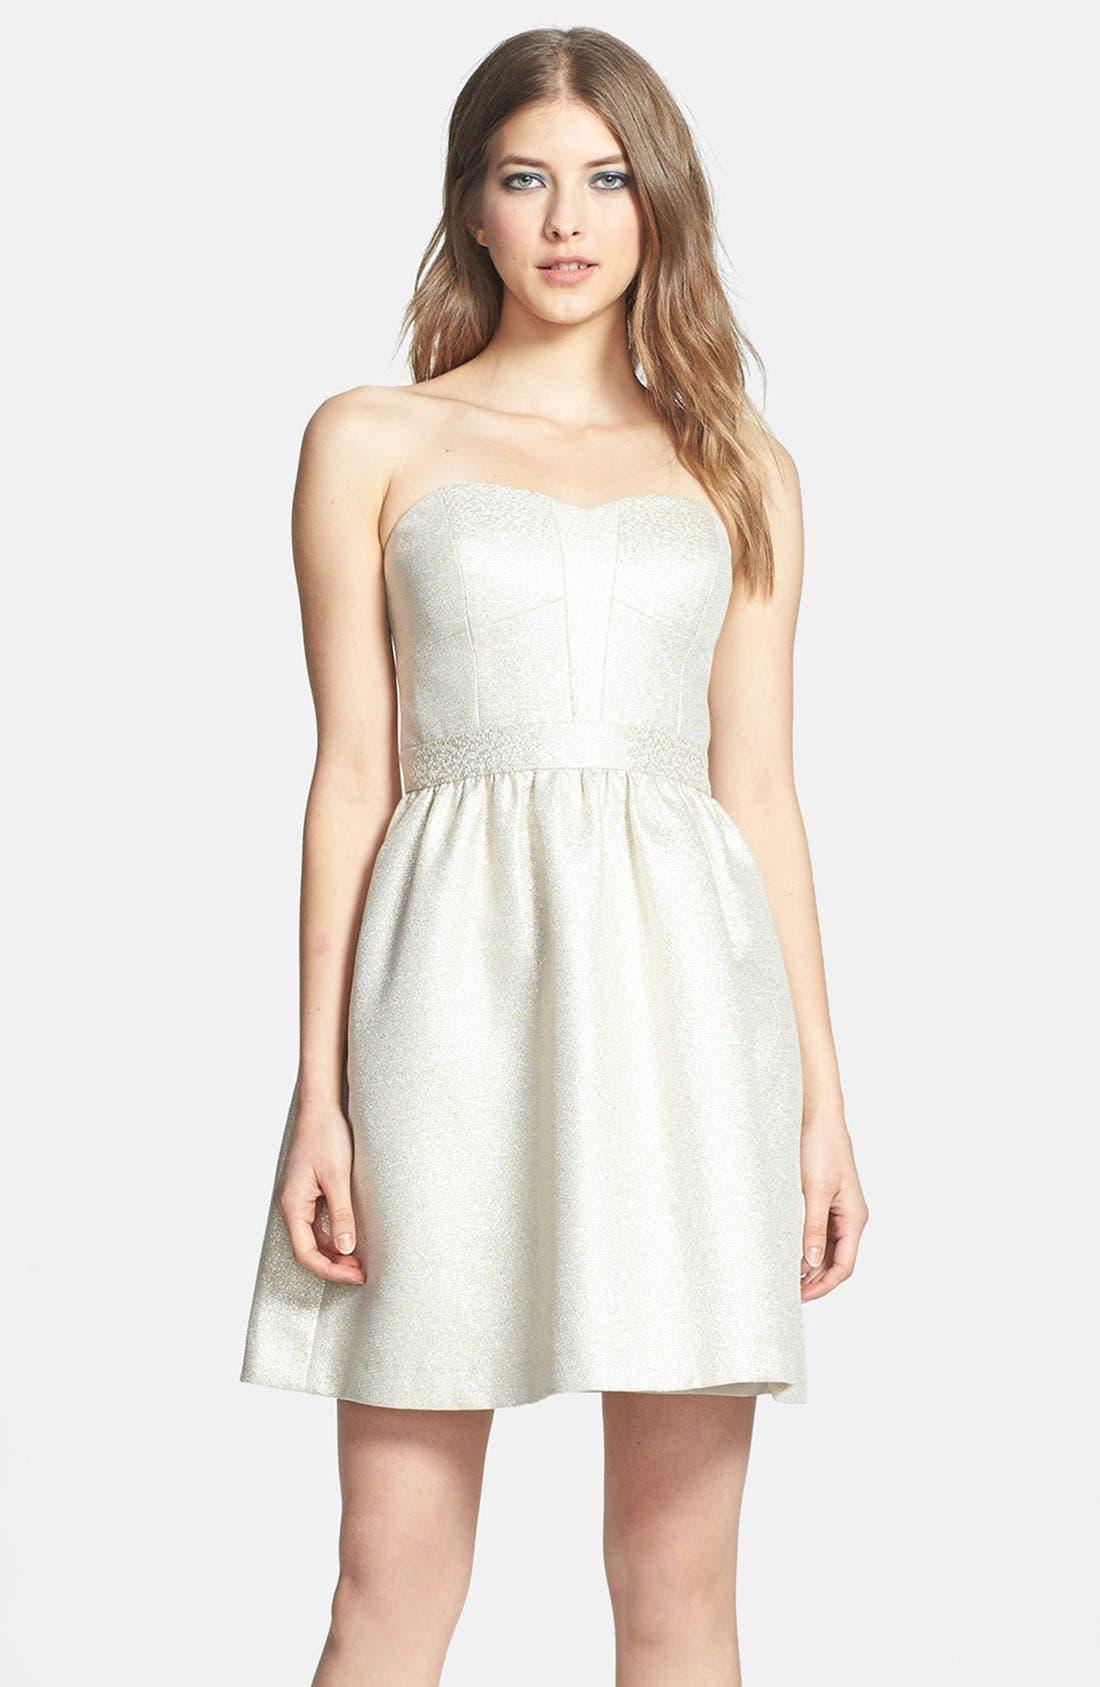 Main Image - Aidan by Aidan Mattox Strapless Shimmer Jacquard Dress